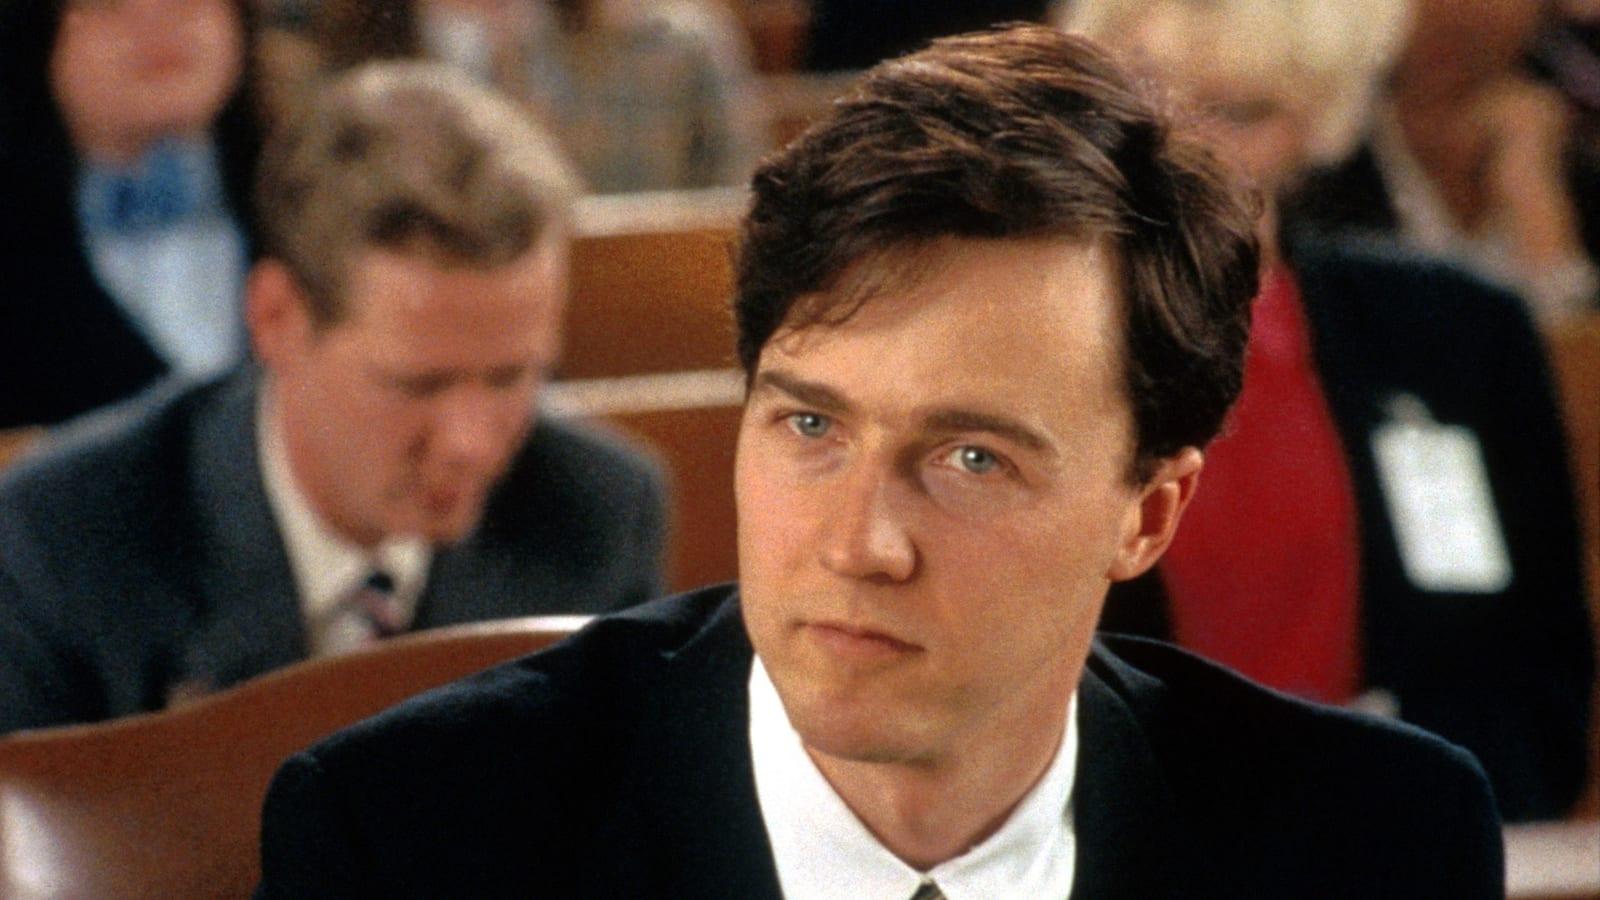 larry-flynt-skandalernas-man-1996